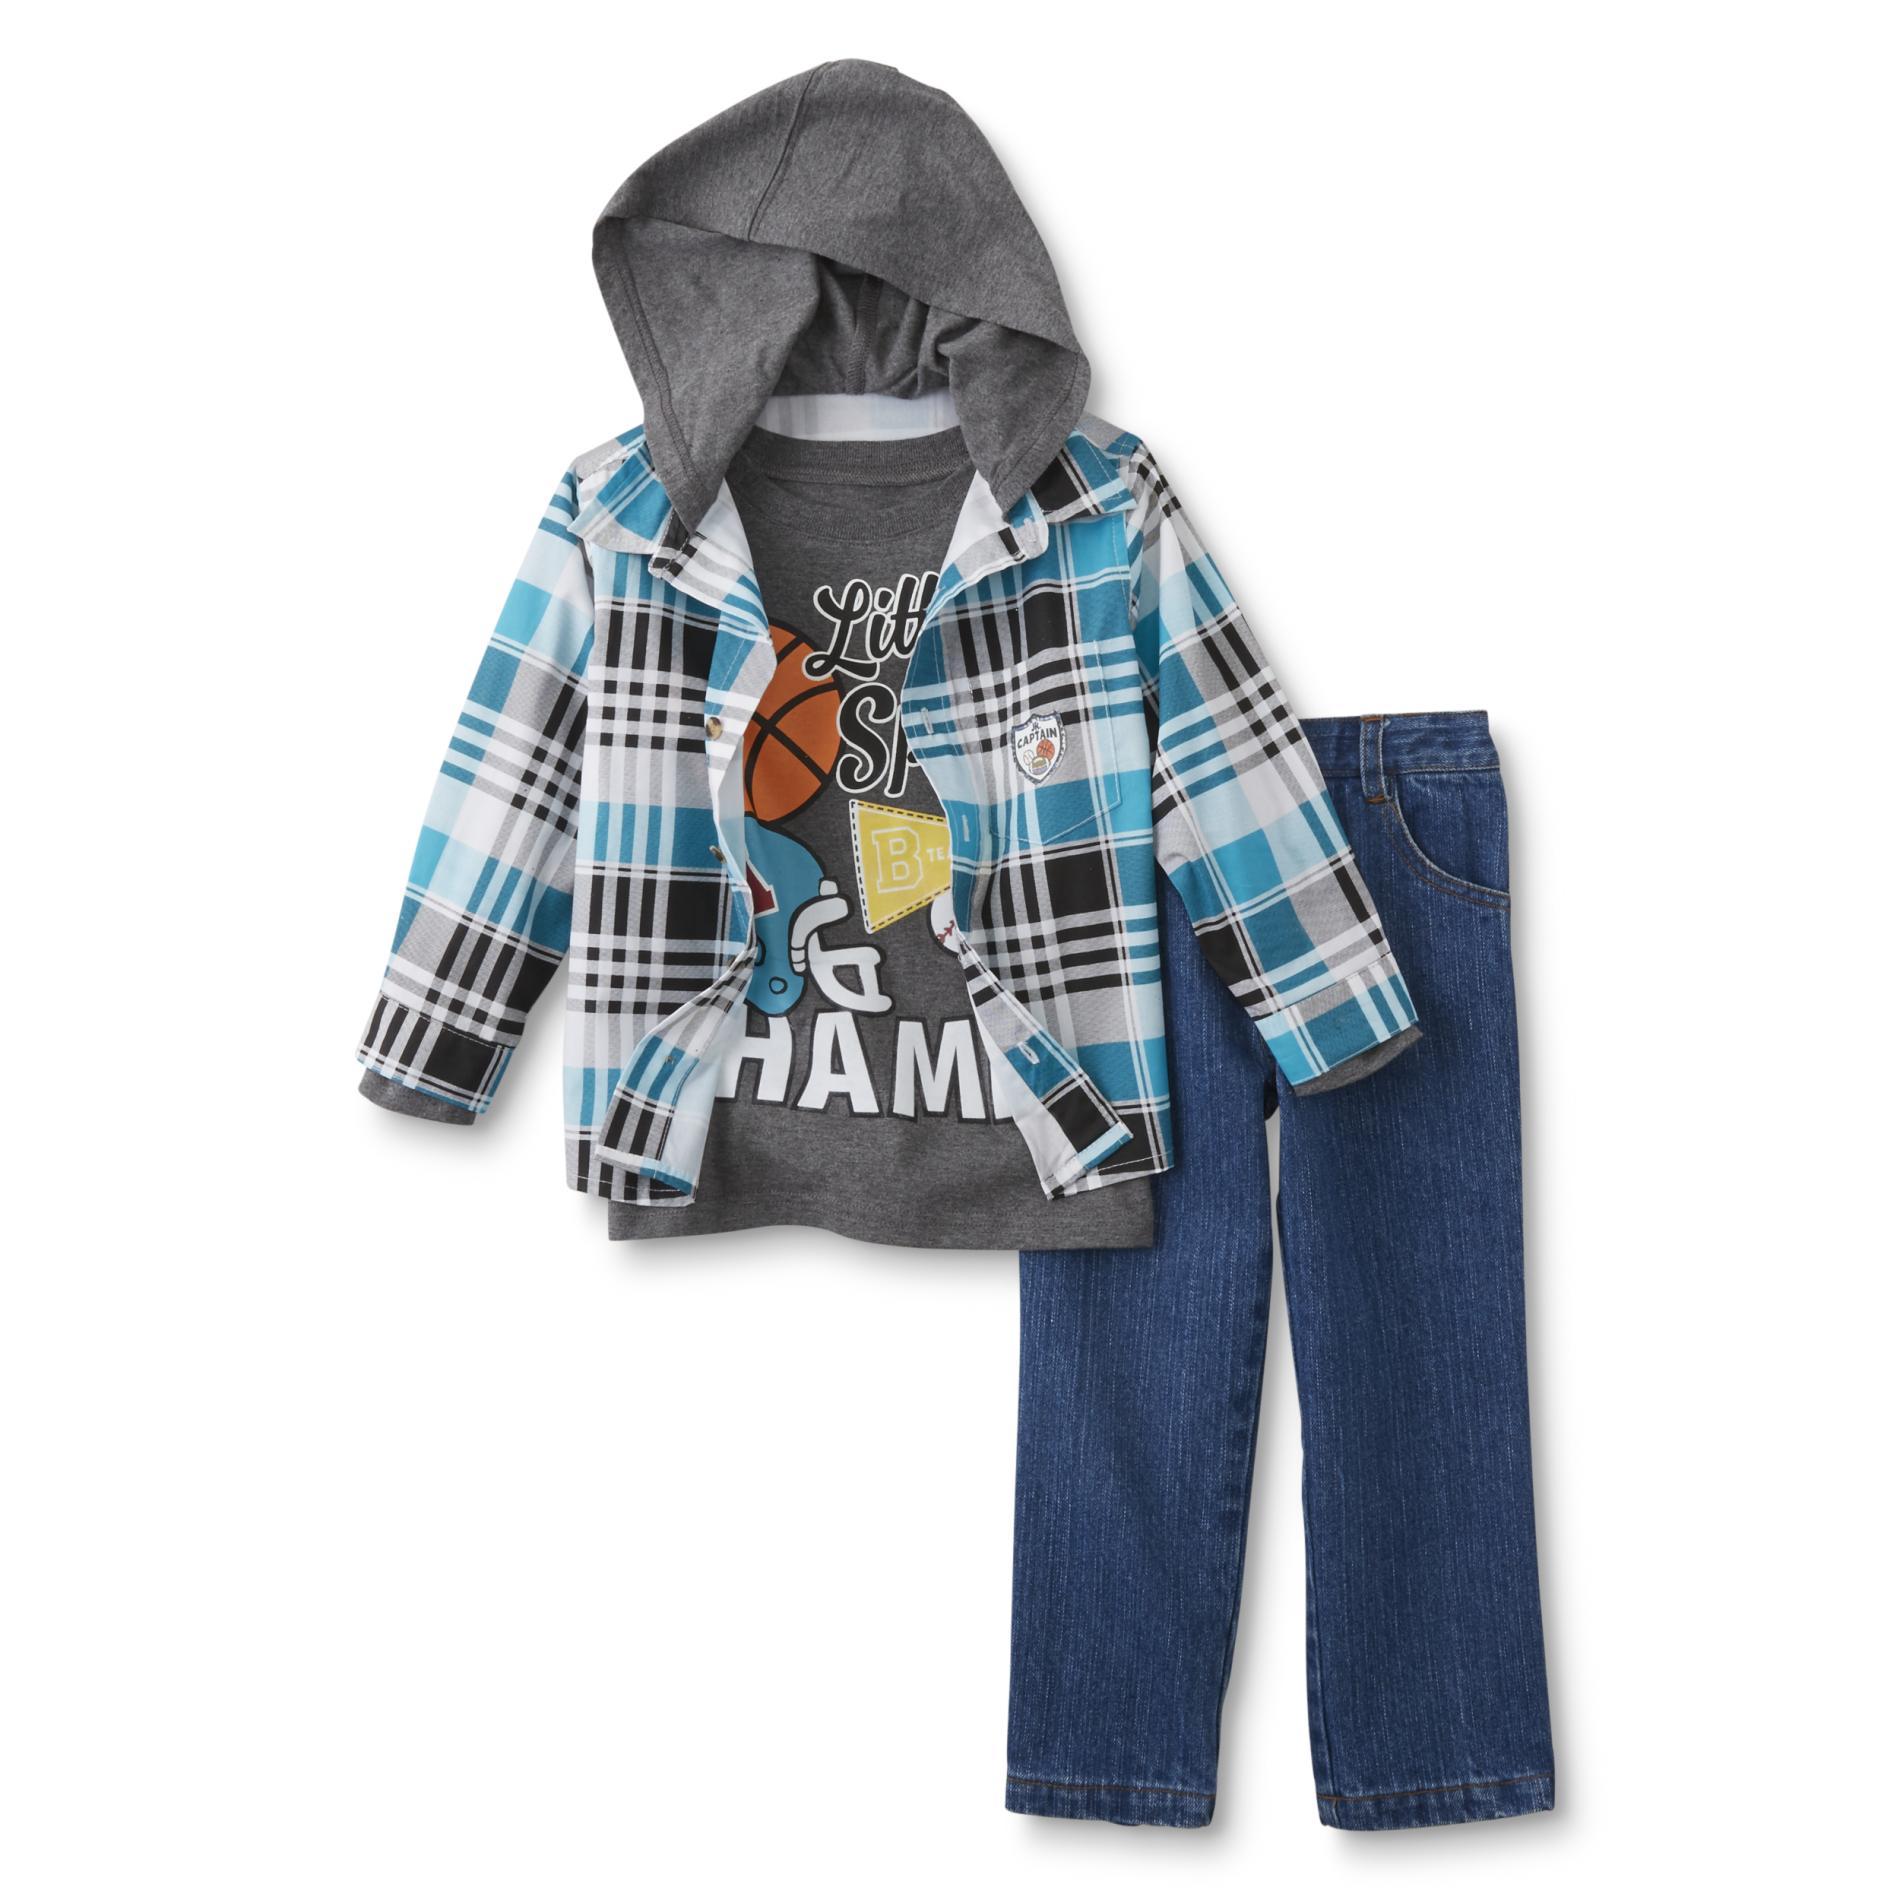 Infant & Toddler Boy's Shirt, T-Shirt & Jeans - Plaid